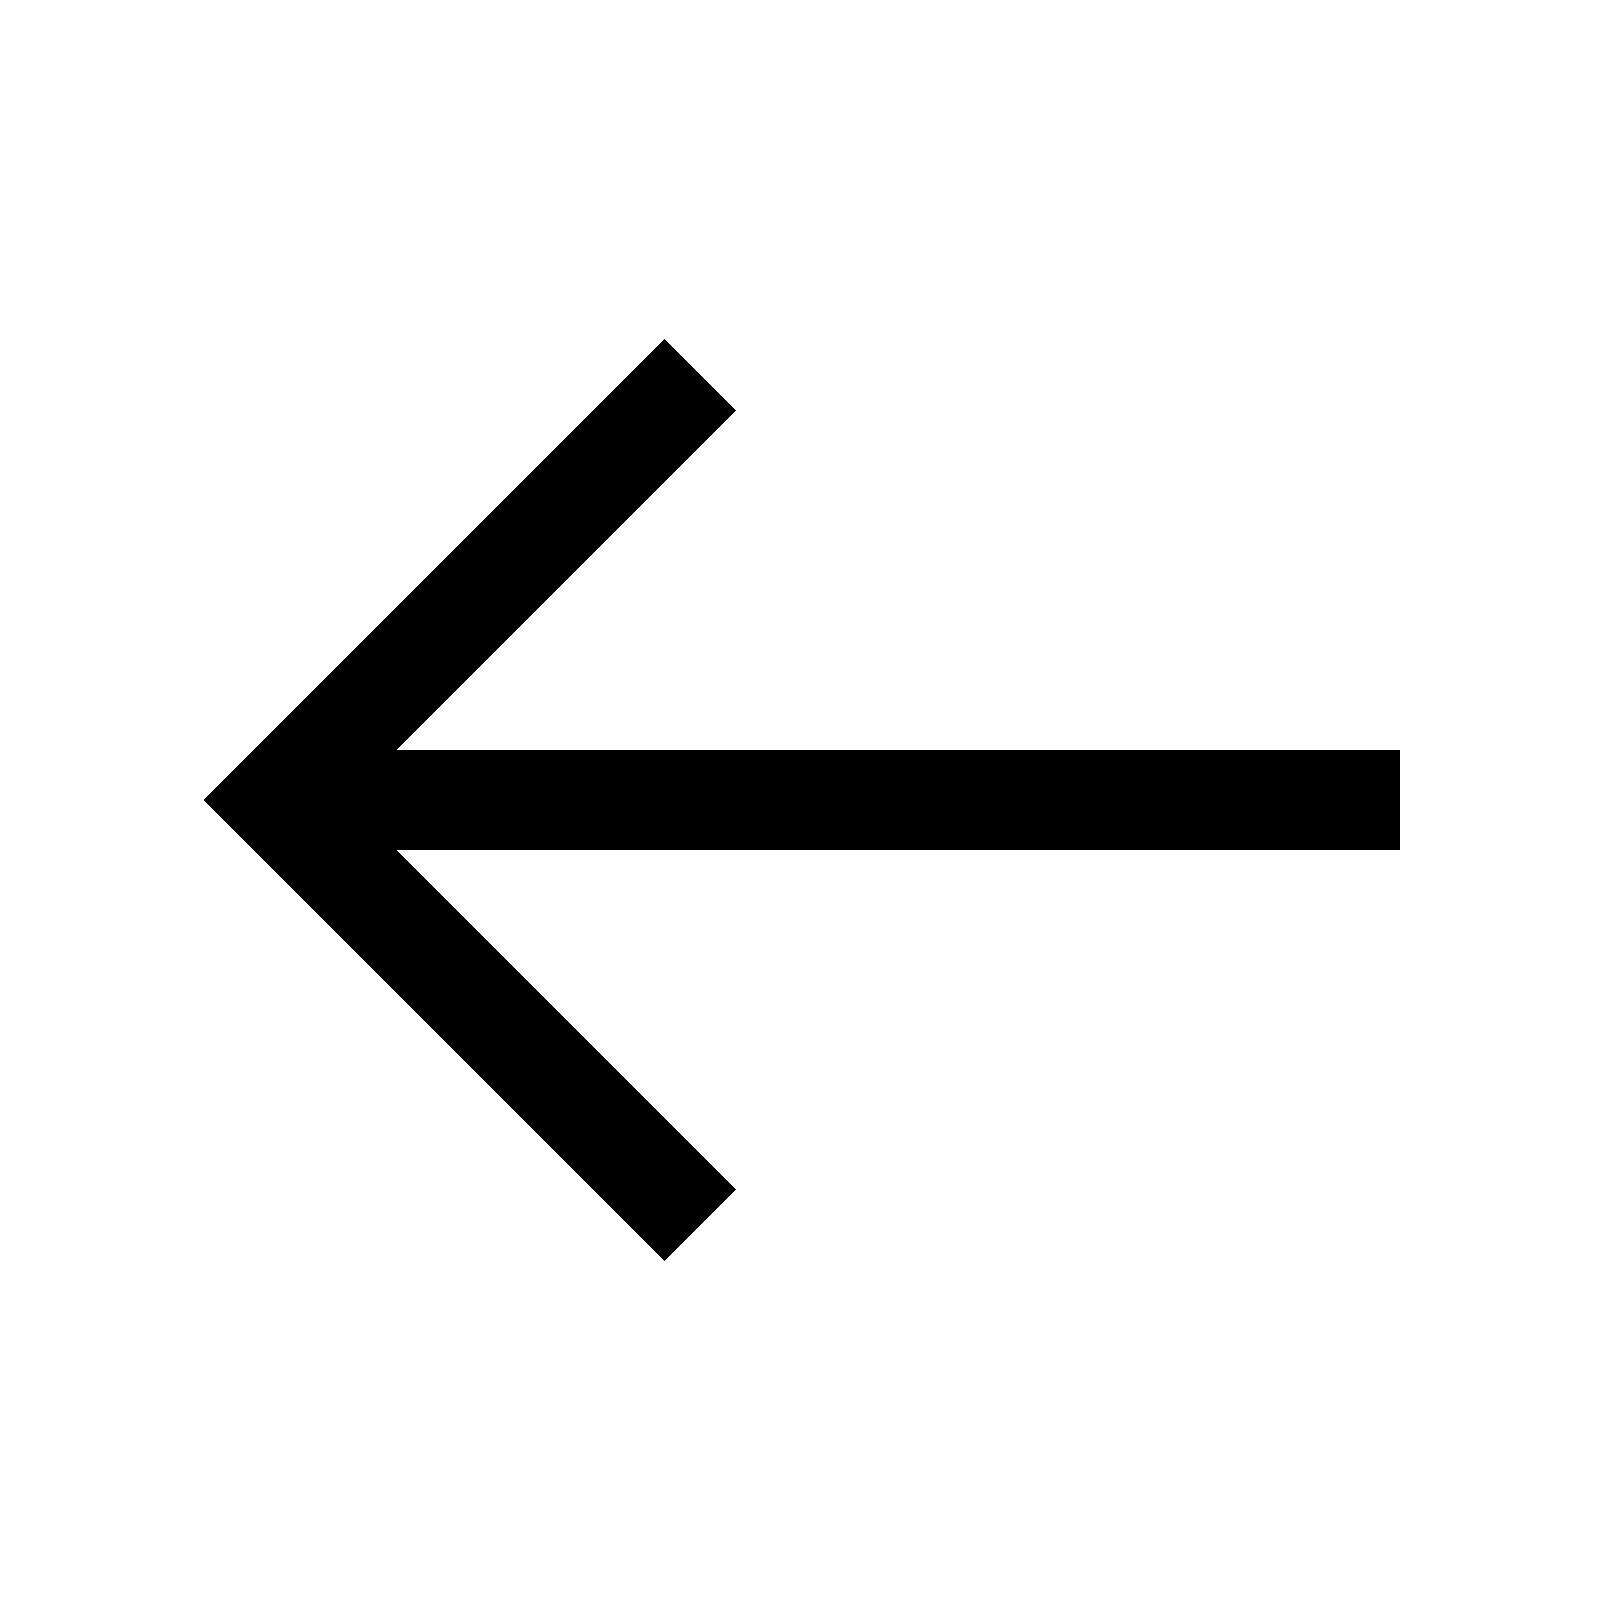 back_arrow